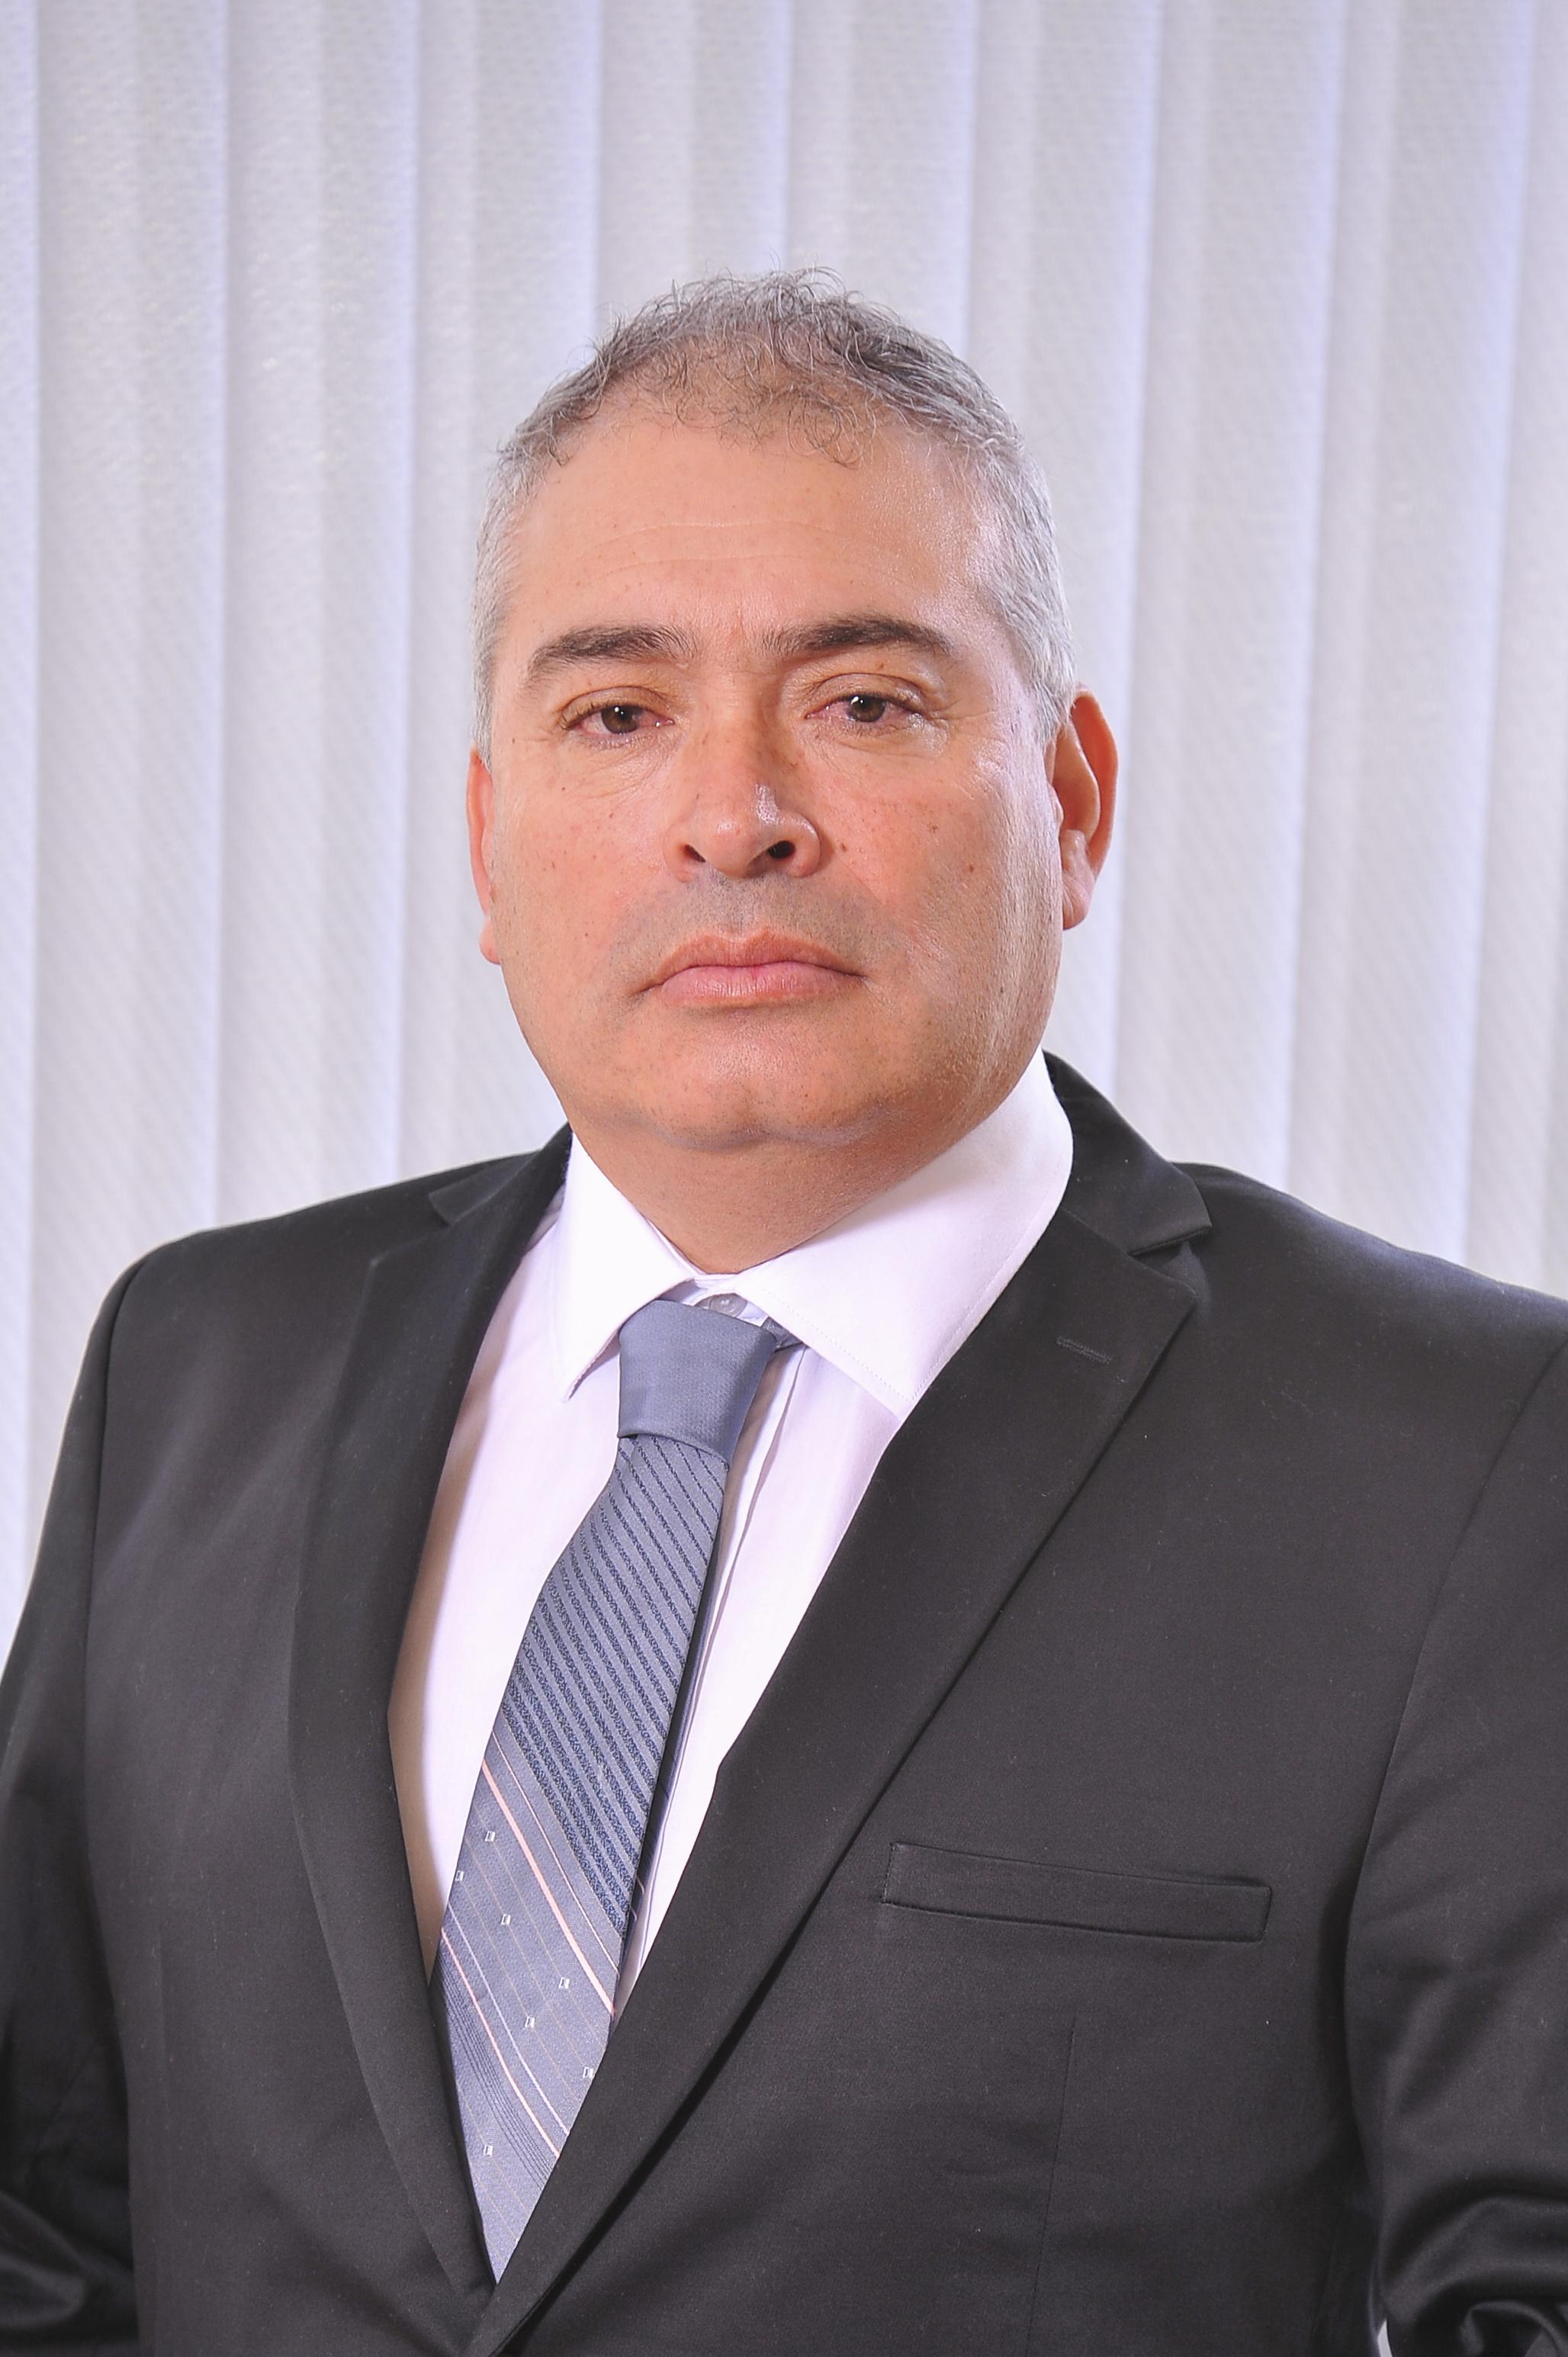 Rodolfo Alonso